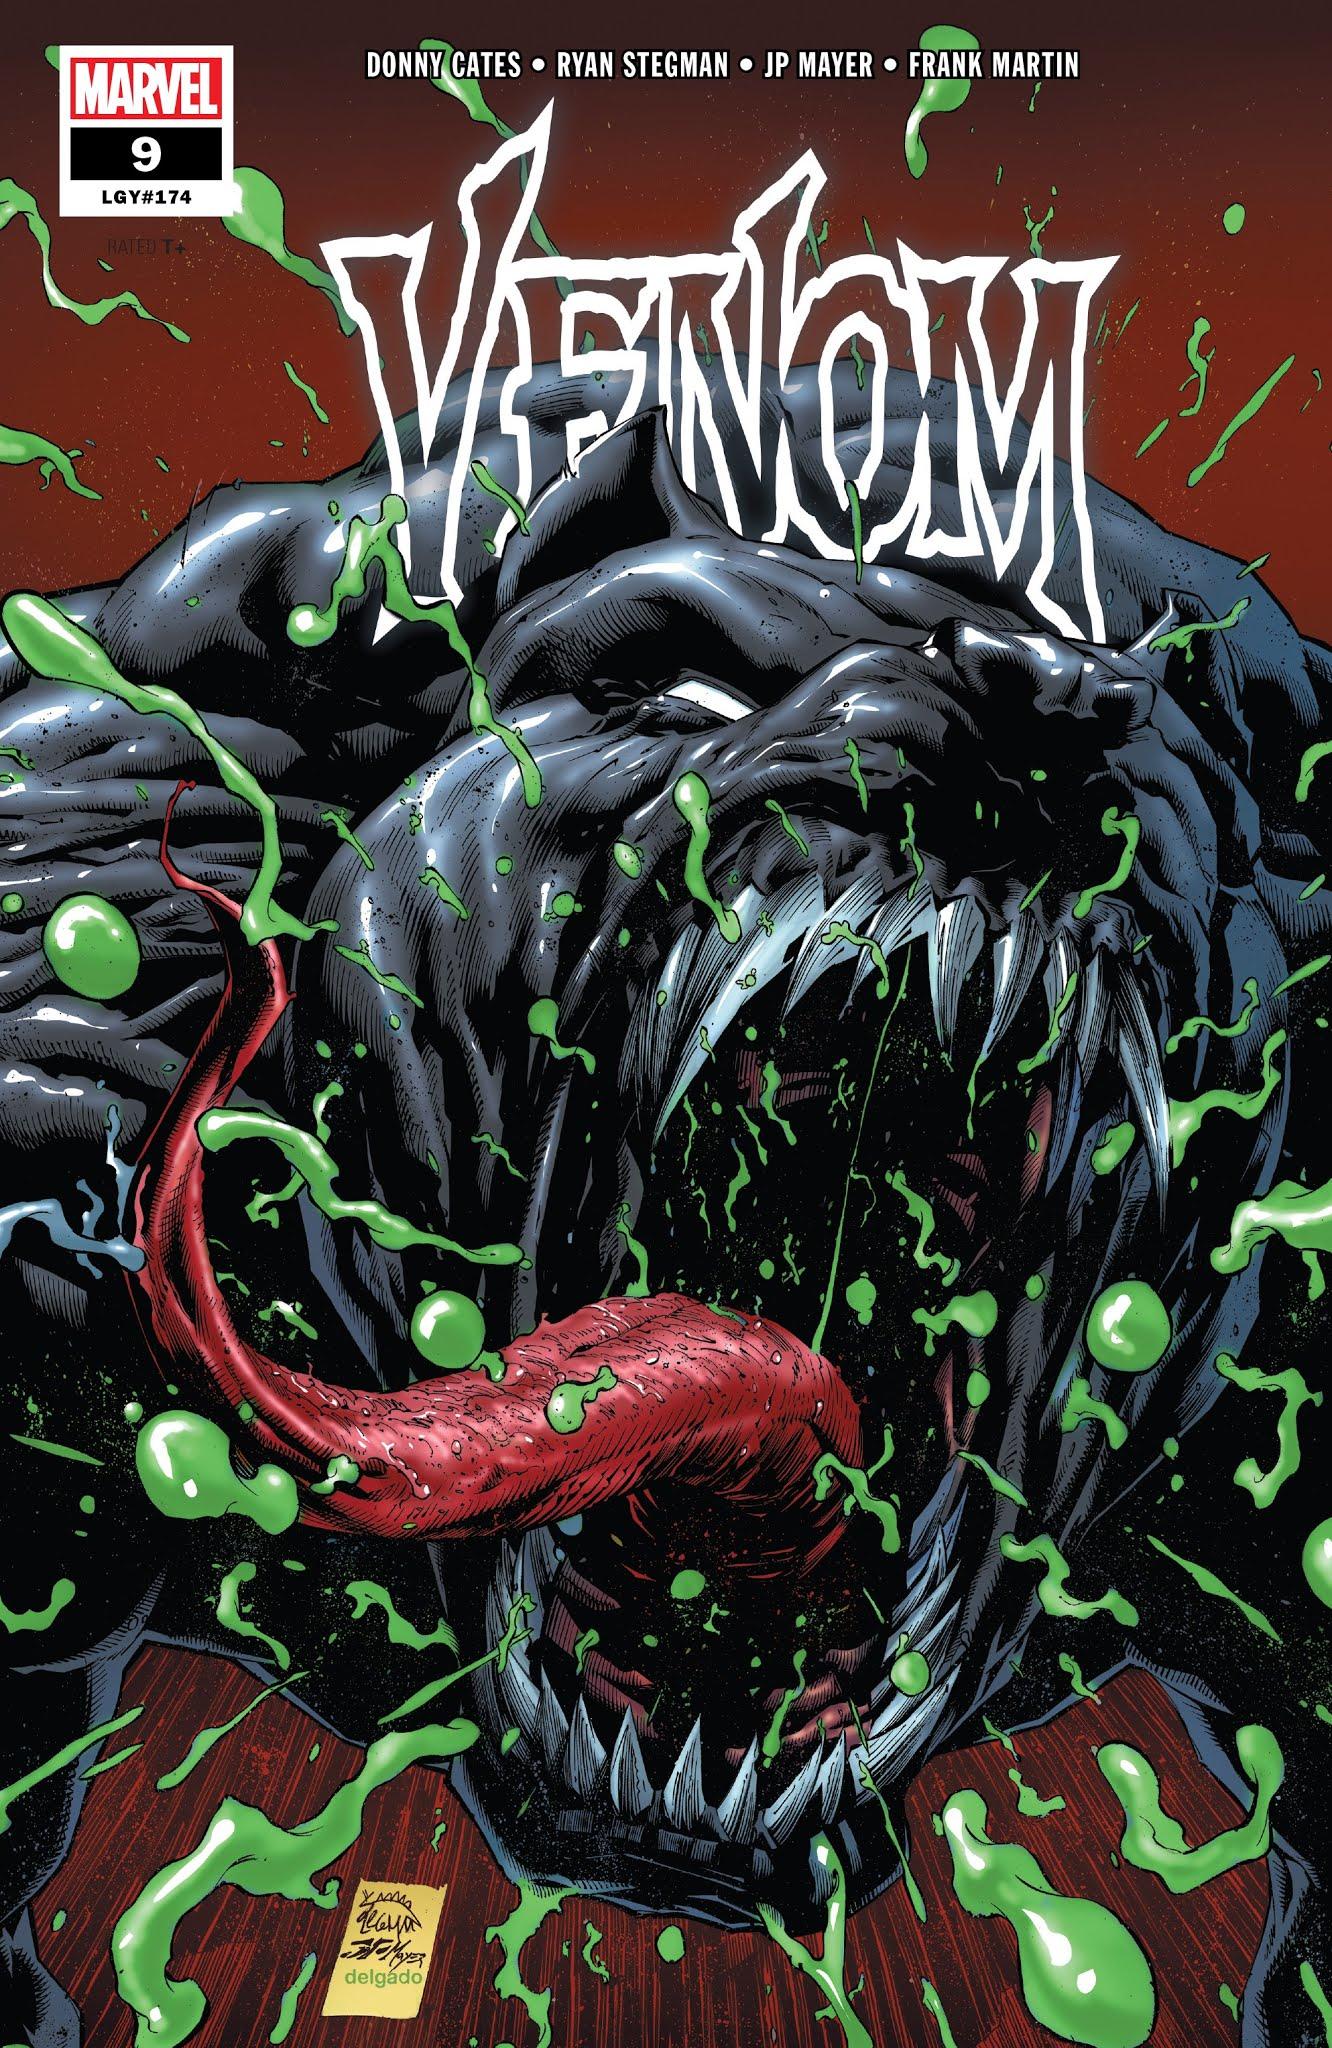 Venom (2018) 9 Page 1